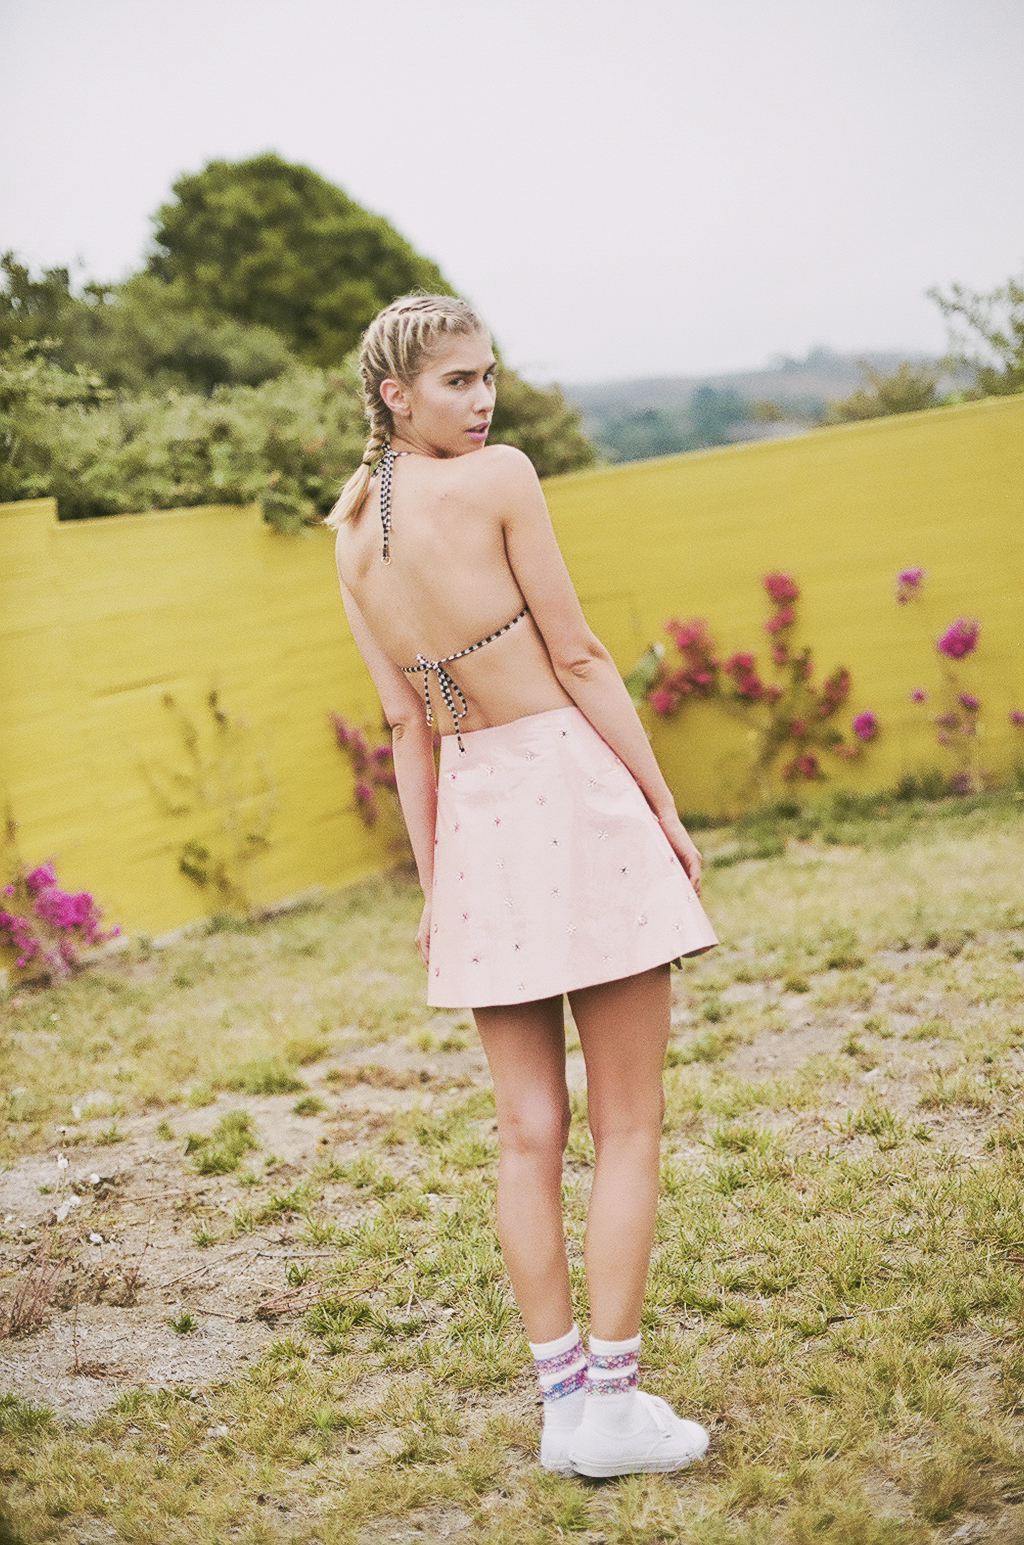 AzaZieglerCalleDelMar- Lookbook 2014